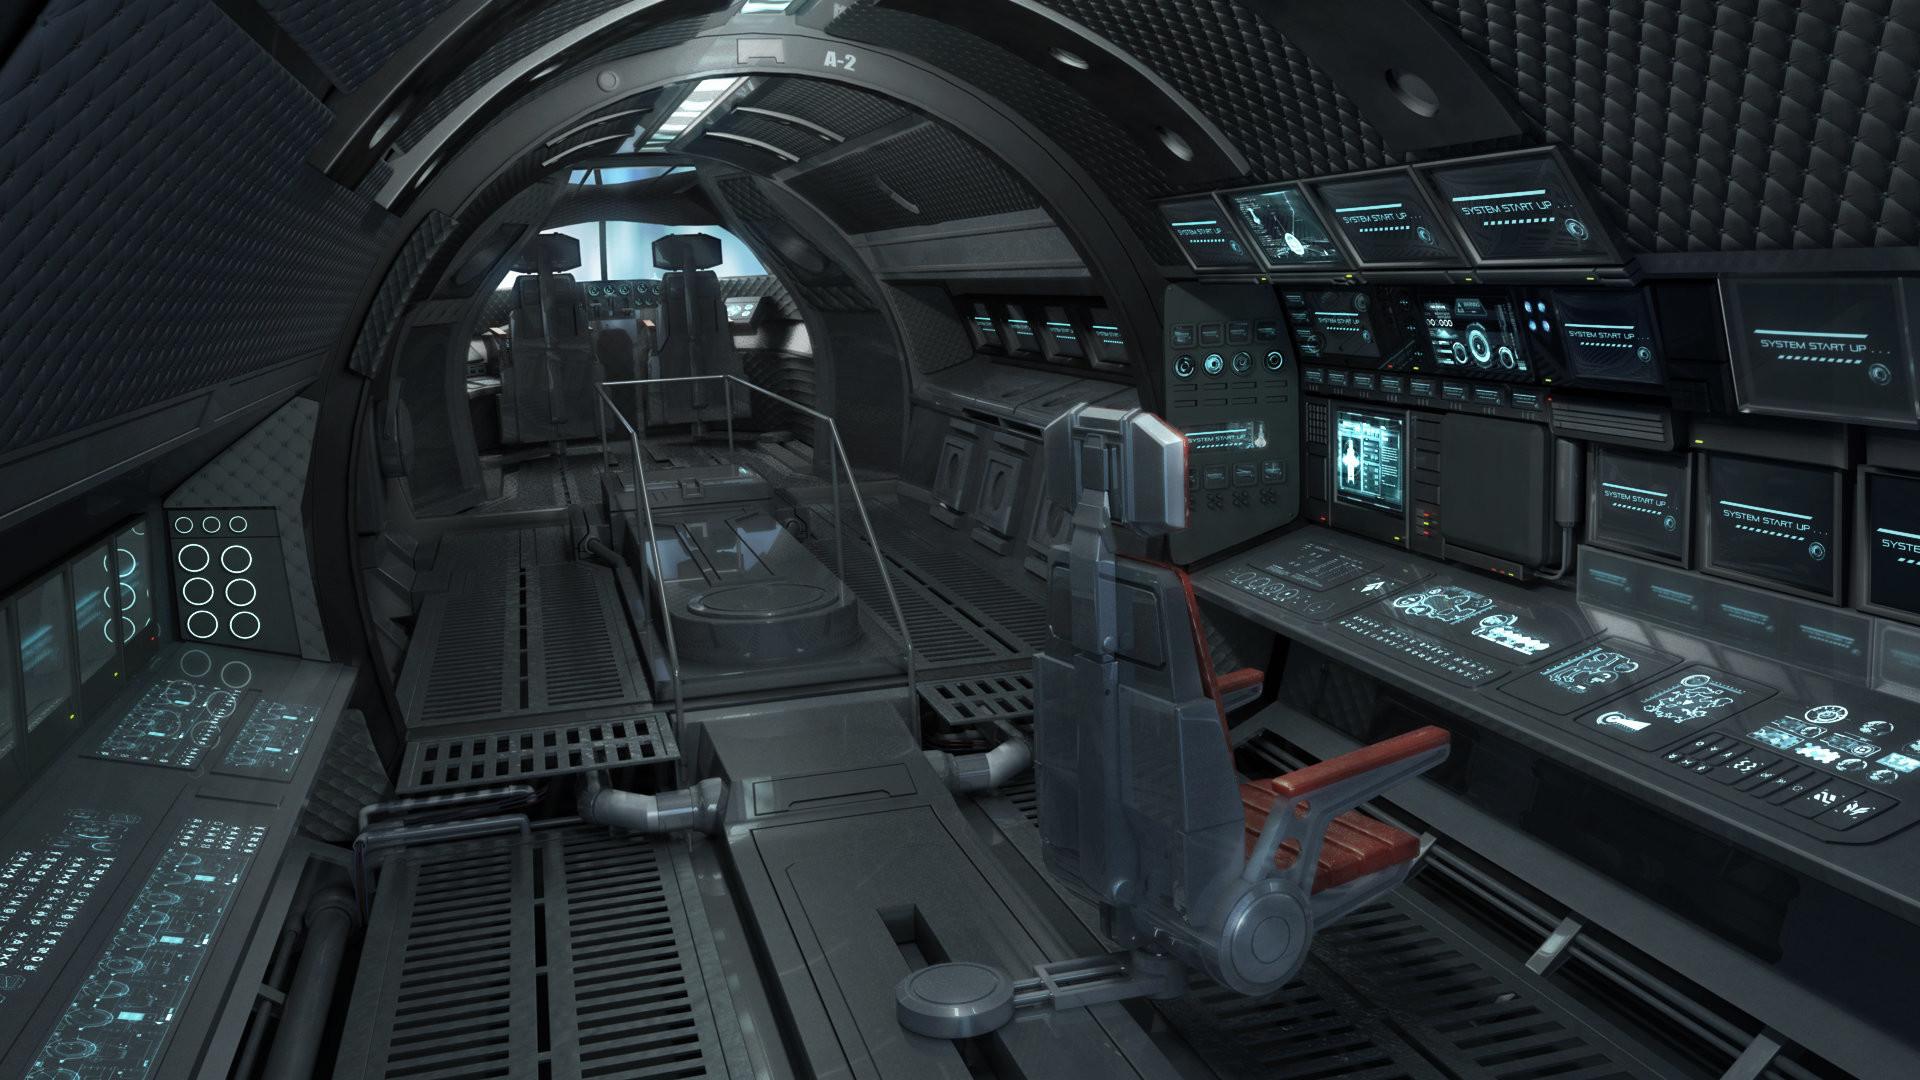 Spaceship Cockpit Wallpaper (70+ images)